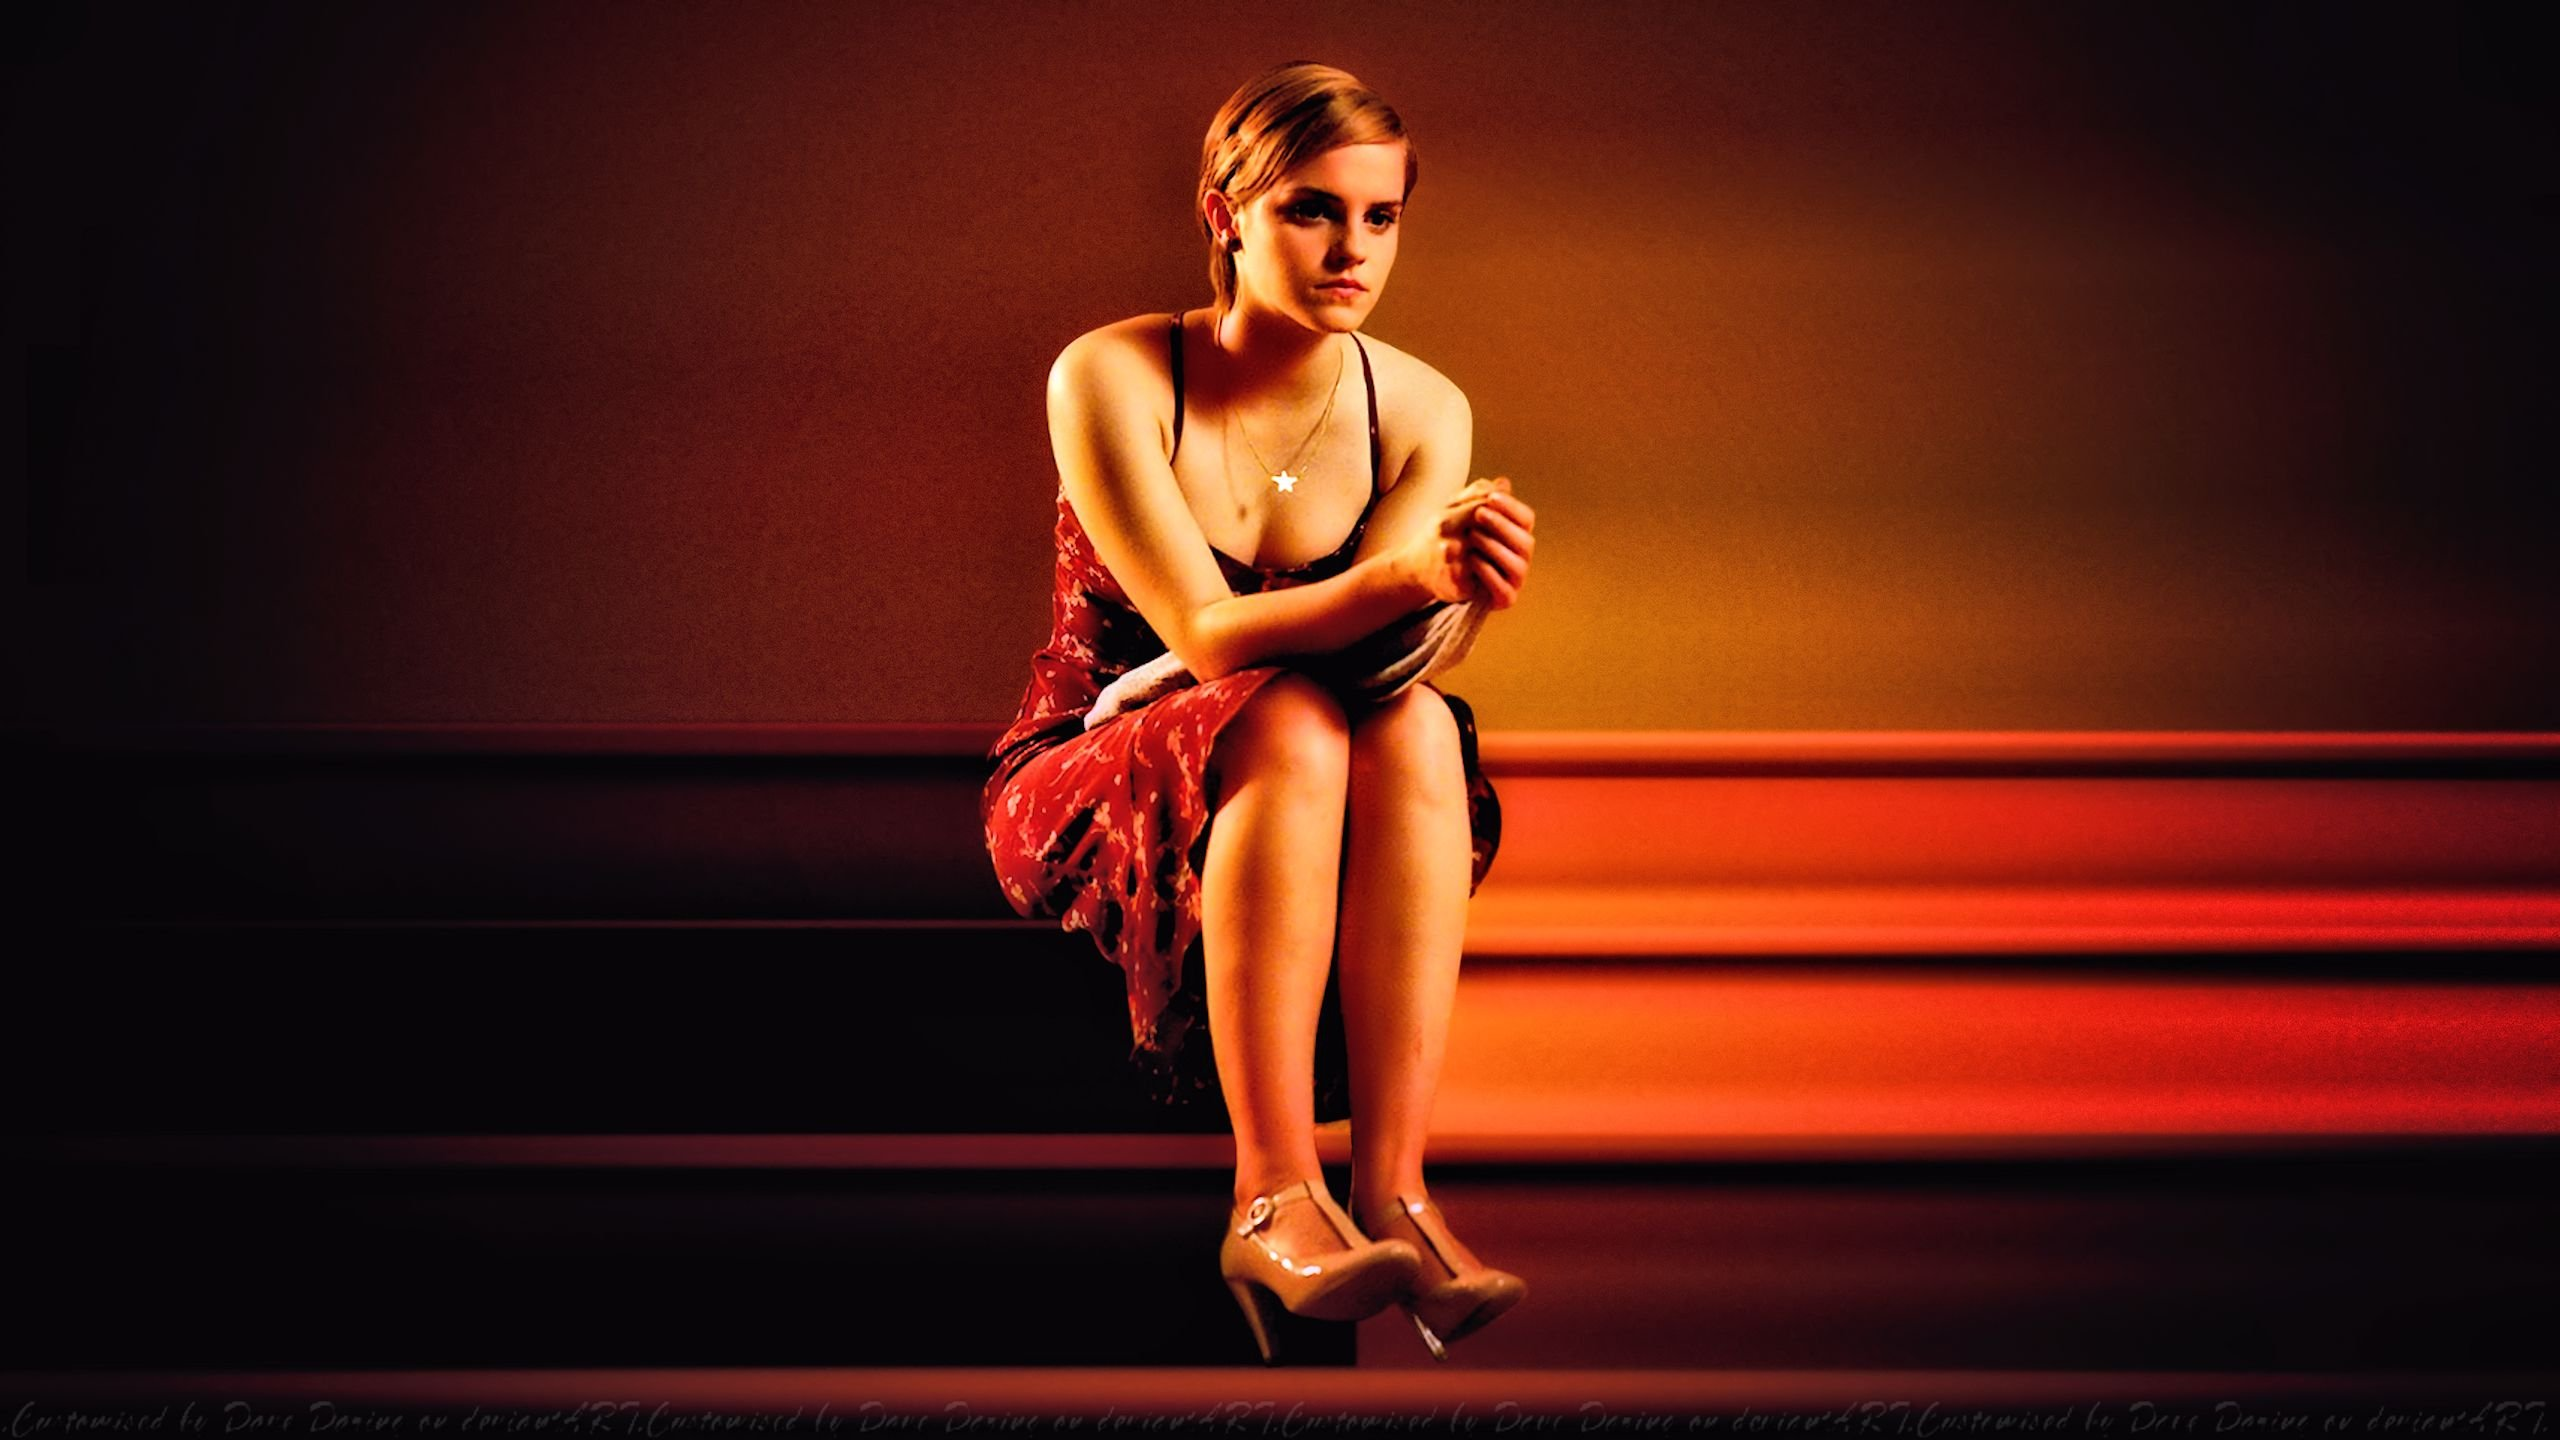 Emma Watson Wallflower Stairs by Dave-Daring